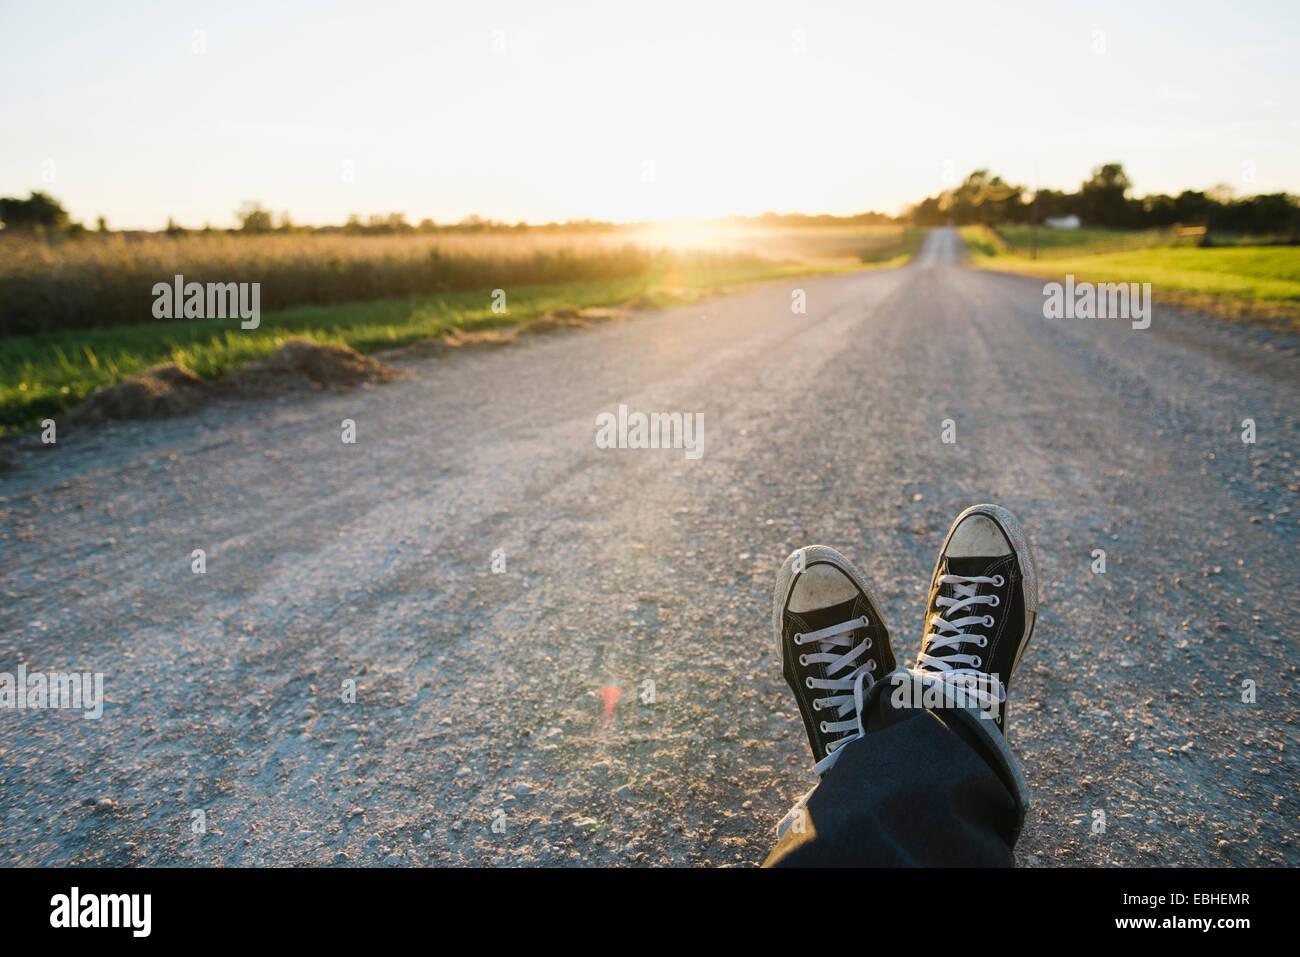 Feet of farmer traveling on rural road at dusk, Plattsburg, Missouri, USA - Stock Image